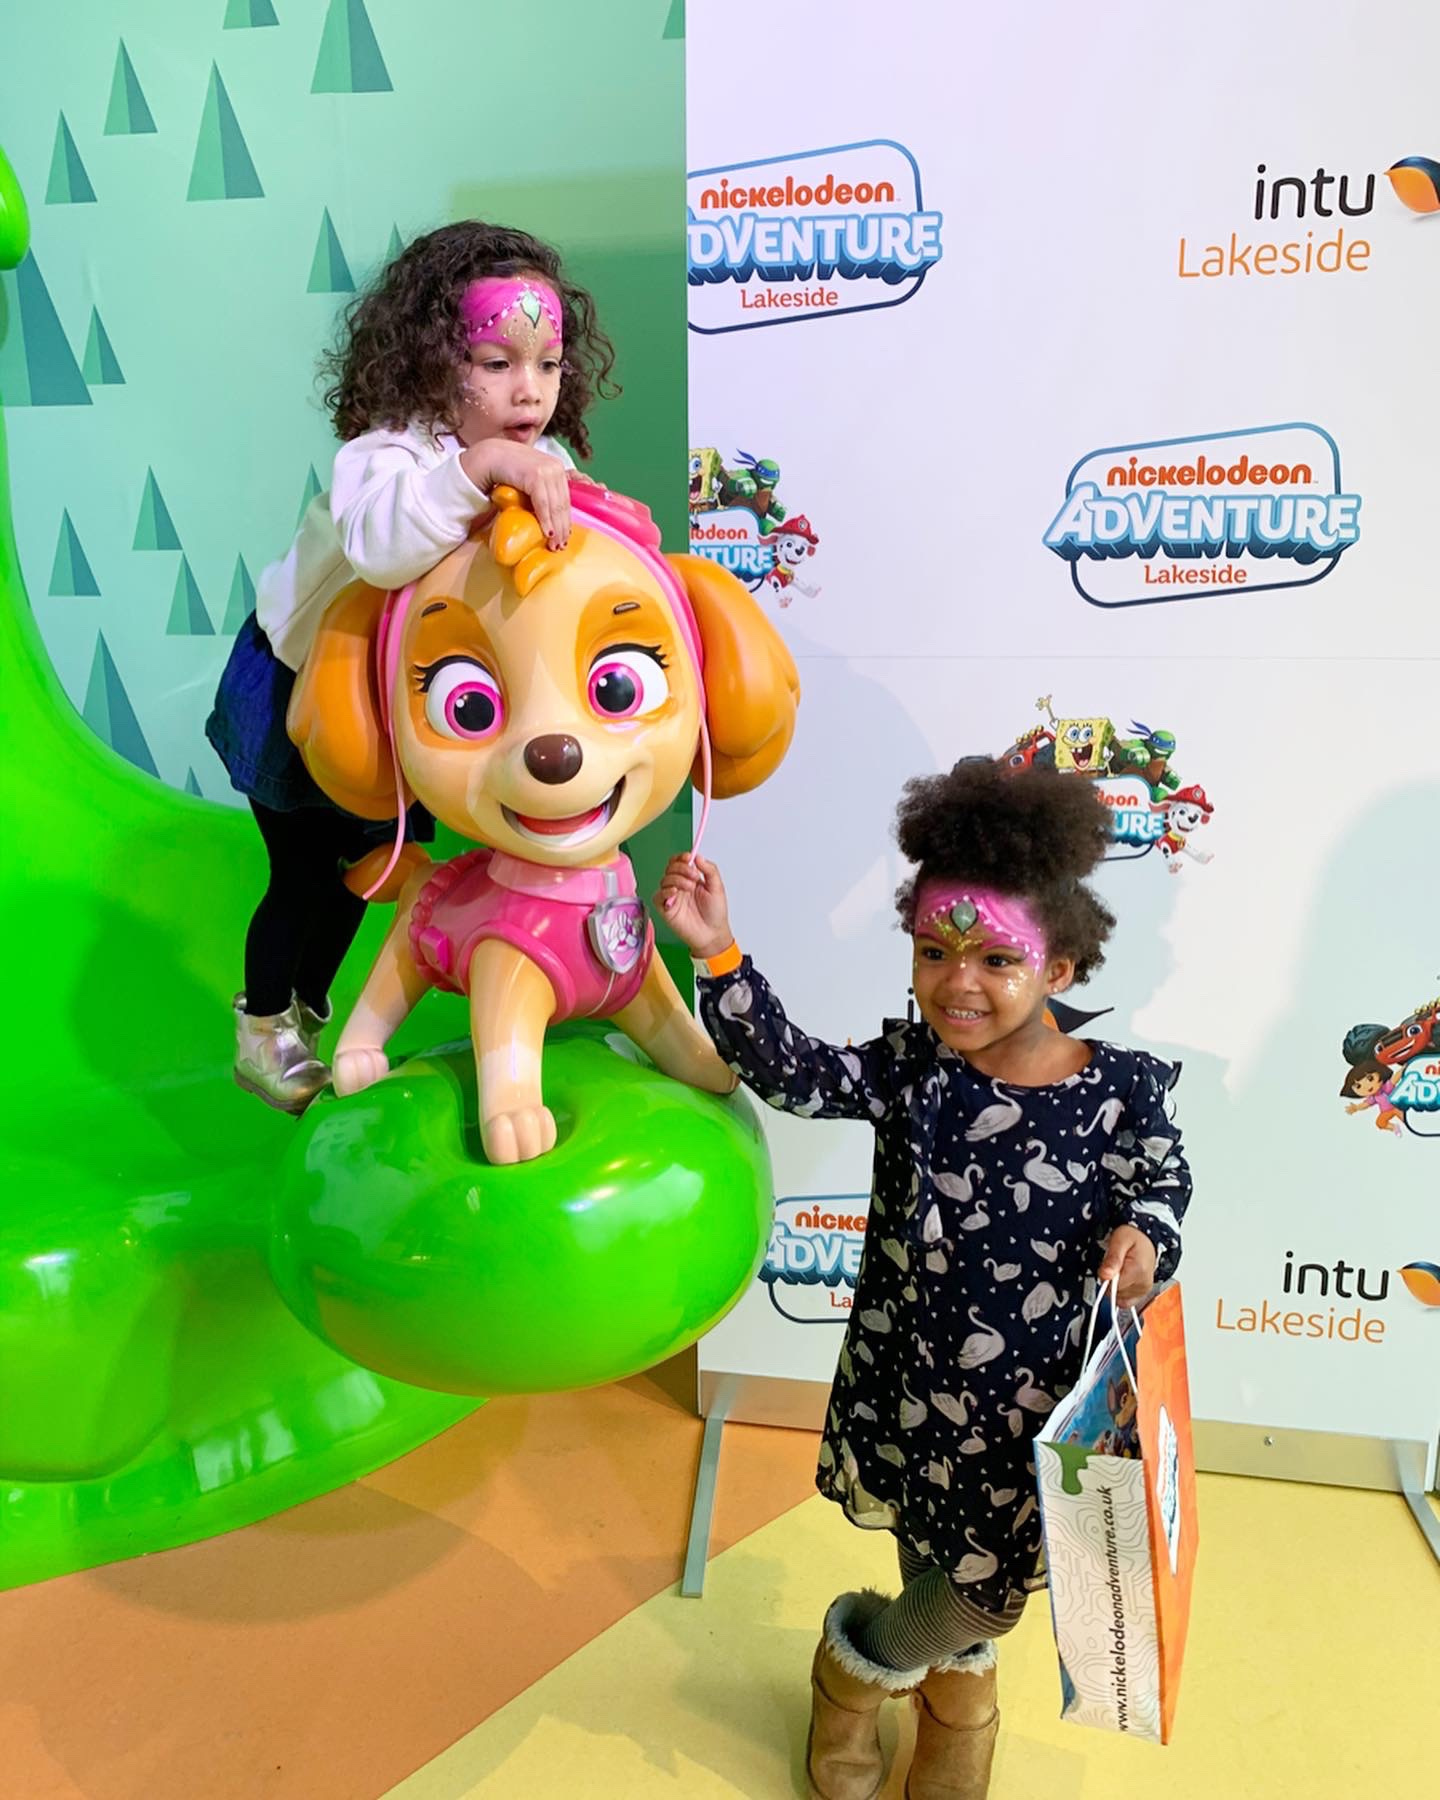 Review Nickelodeon Adventure Lakeside Kiddo Adventures